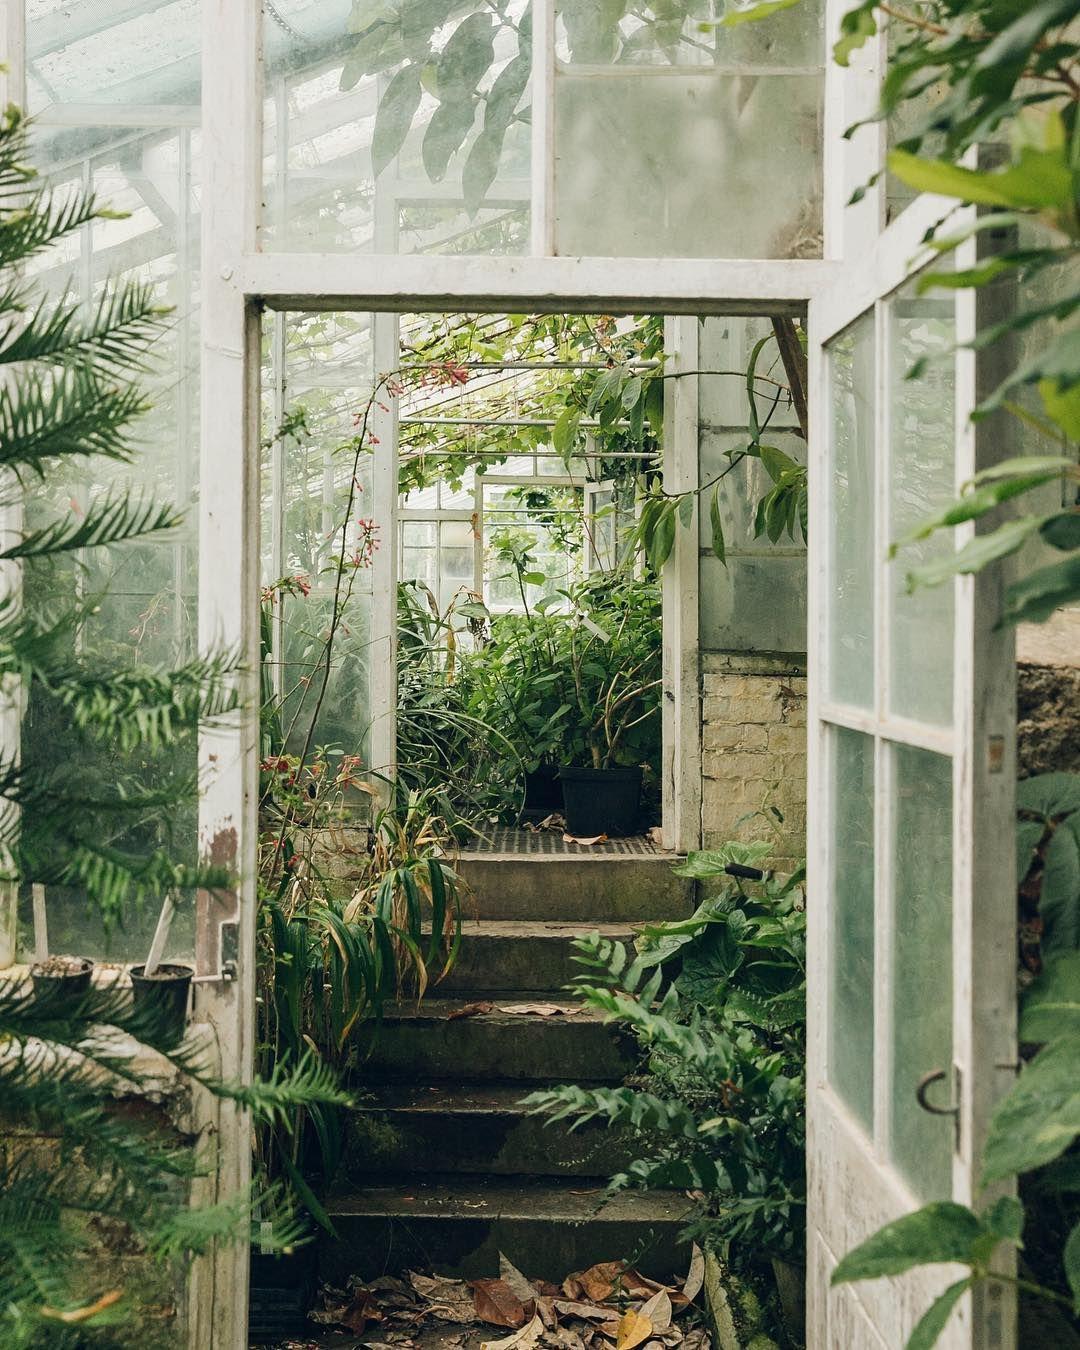 a very very special place haarkongreenhousetour garden shedsgreenhousesthe